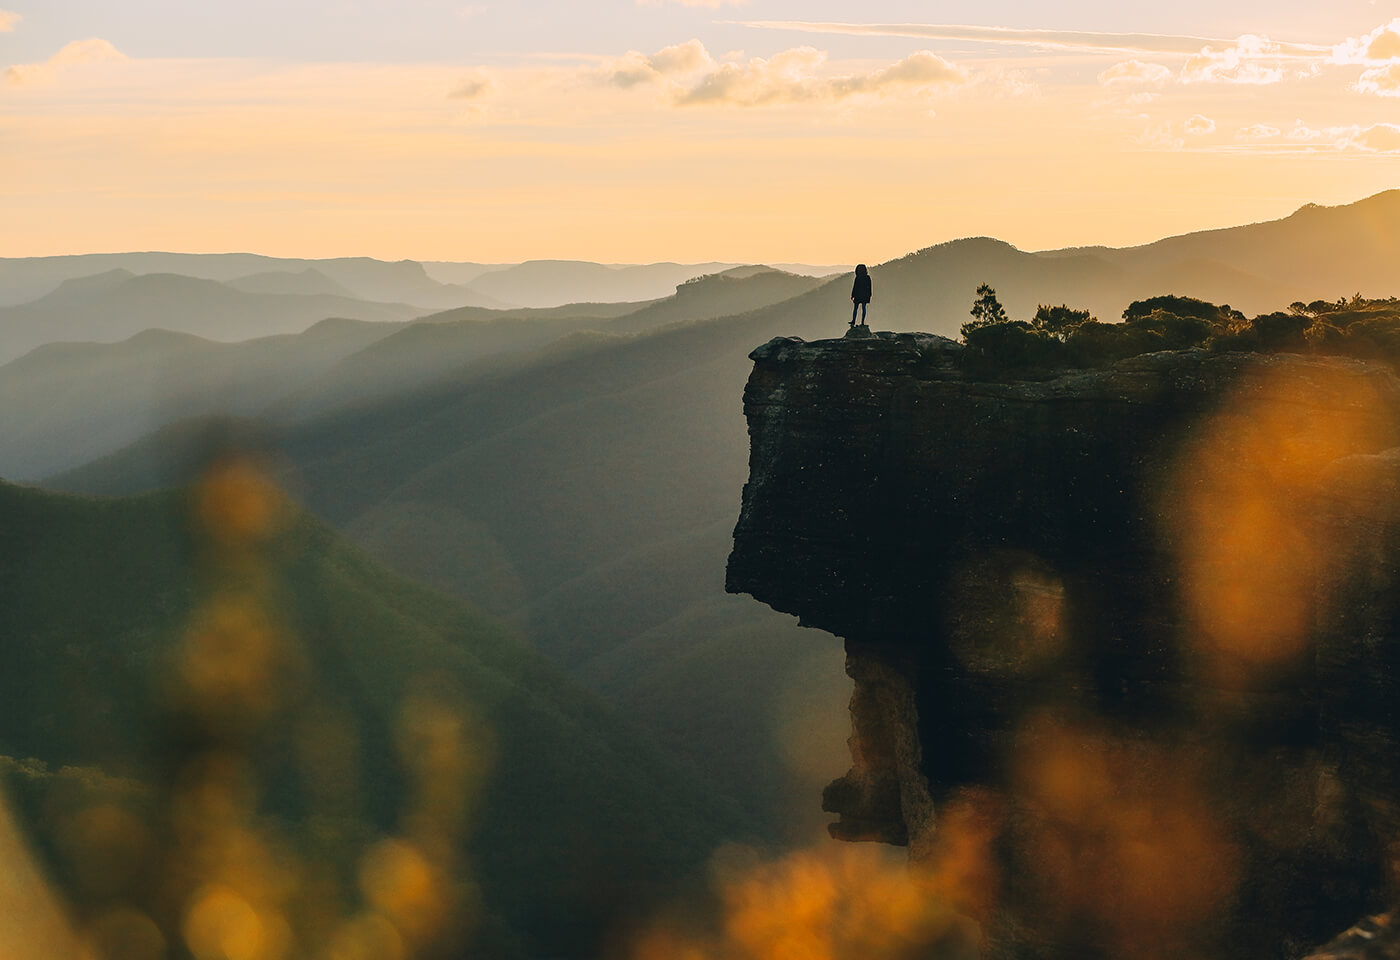 Person on rock cliff edge